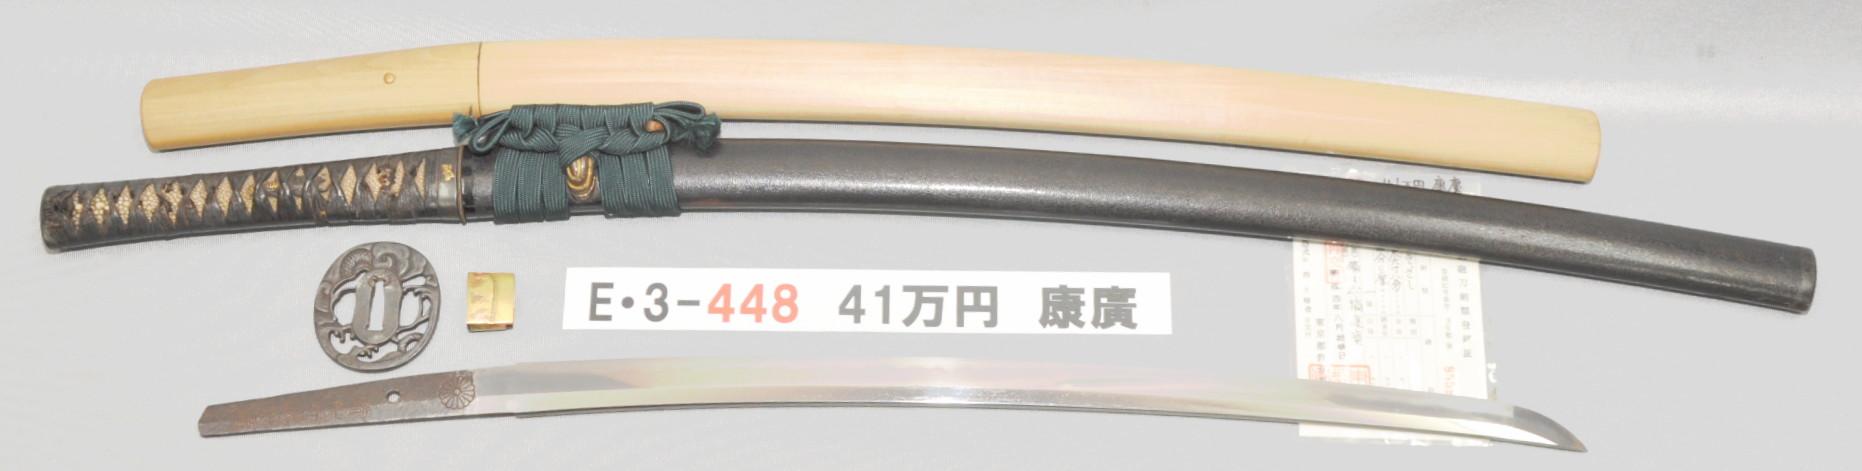 E3448